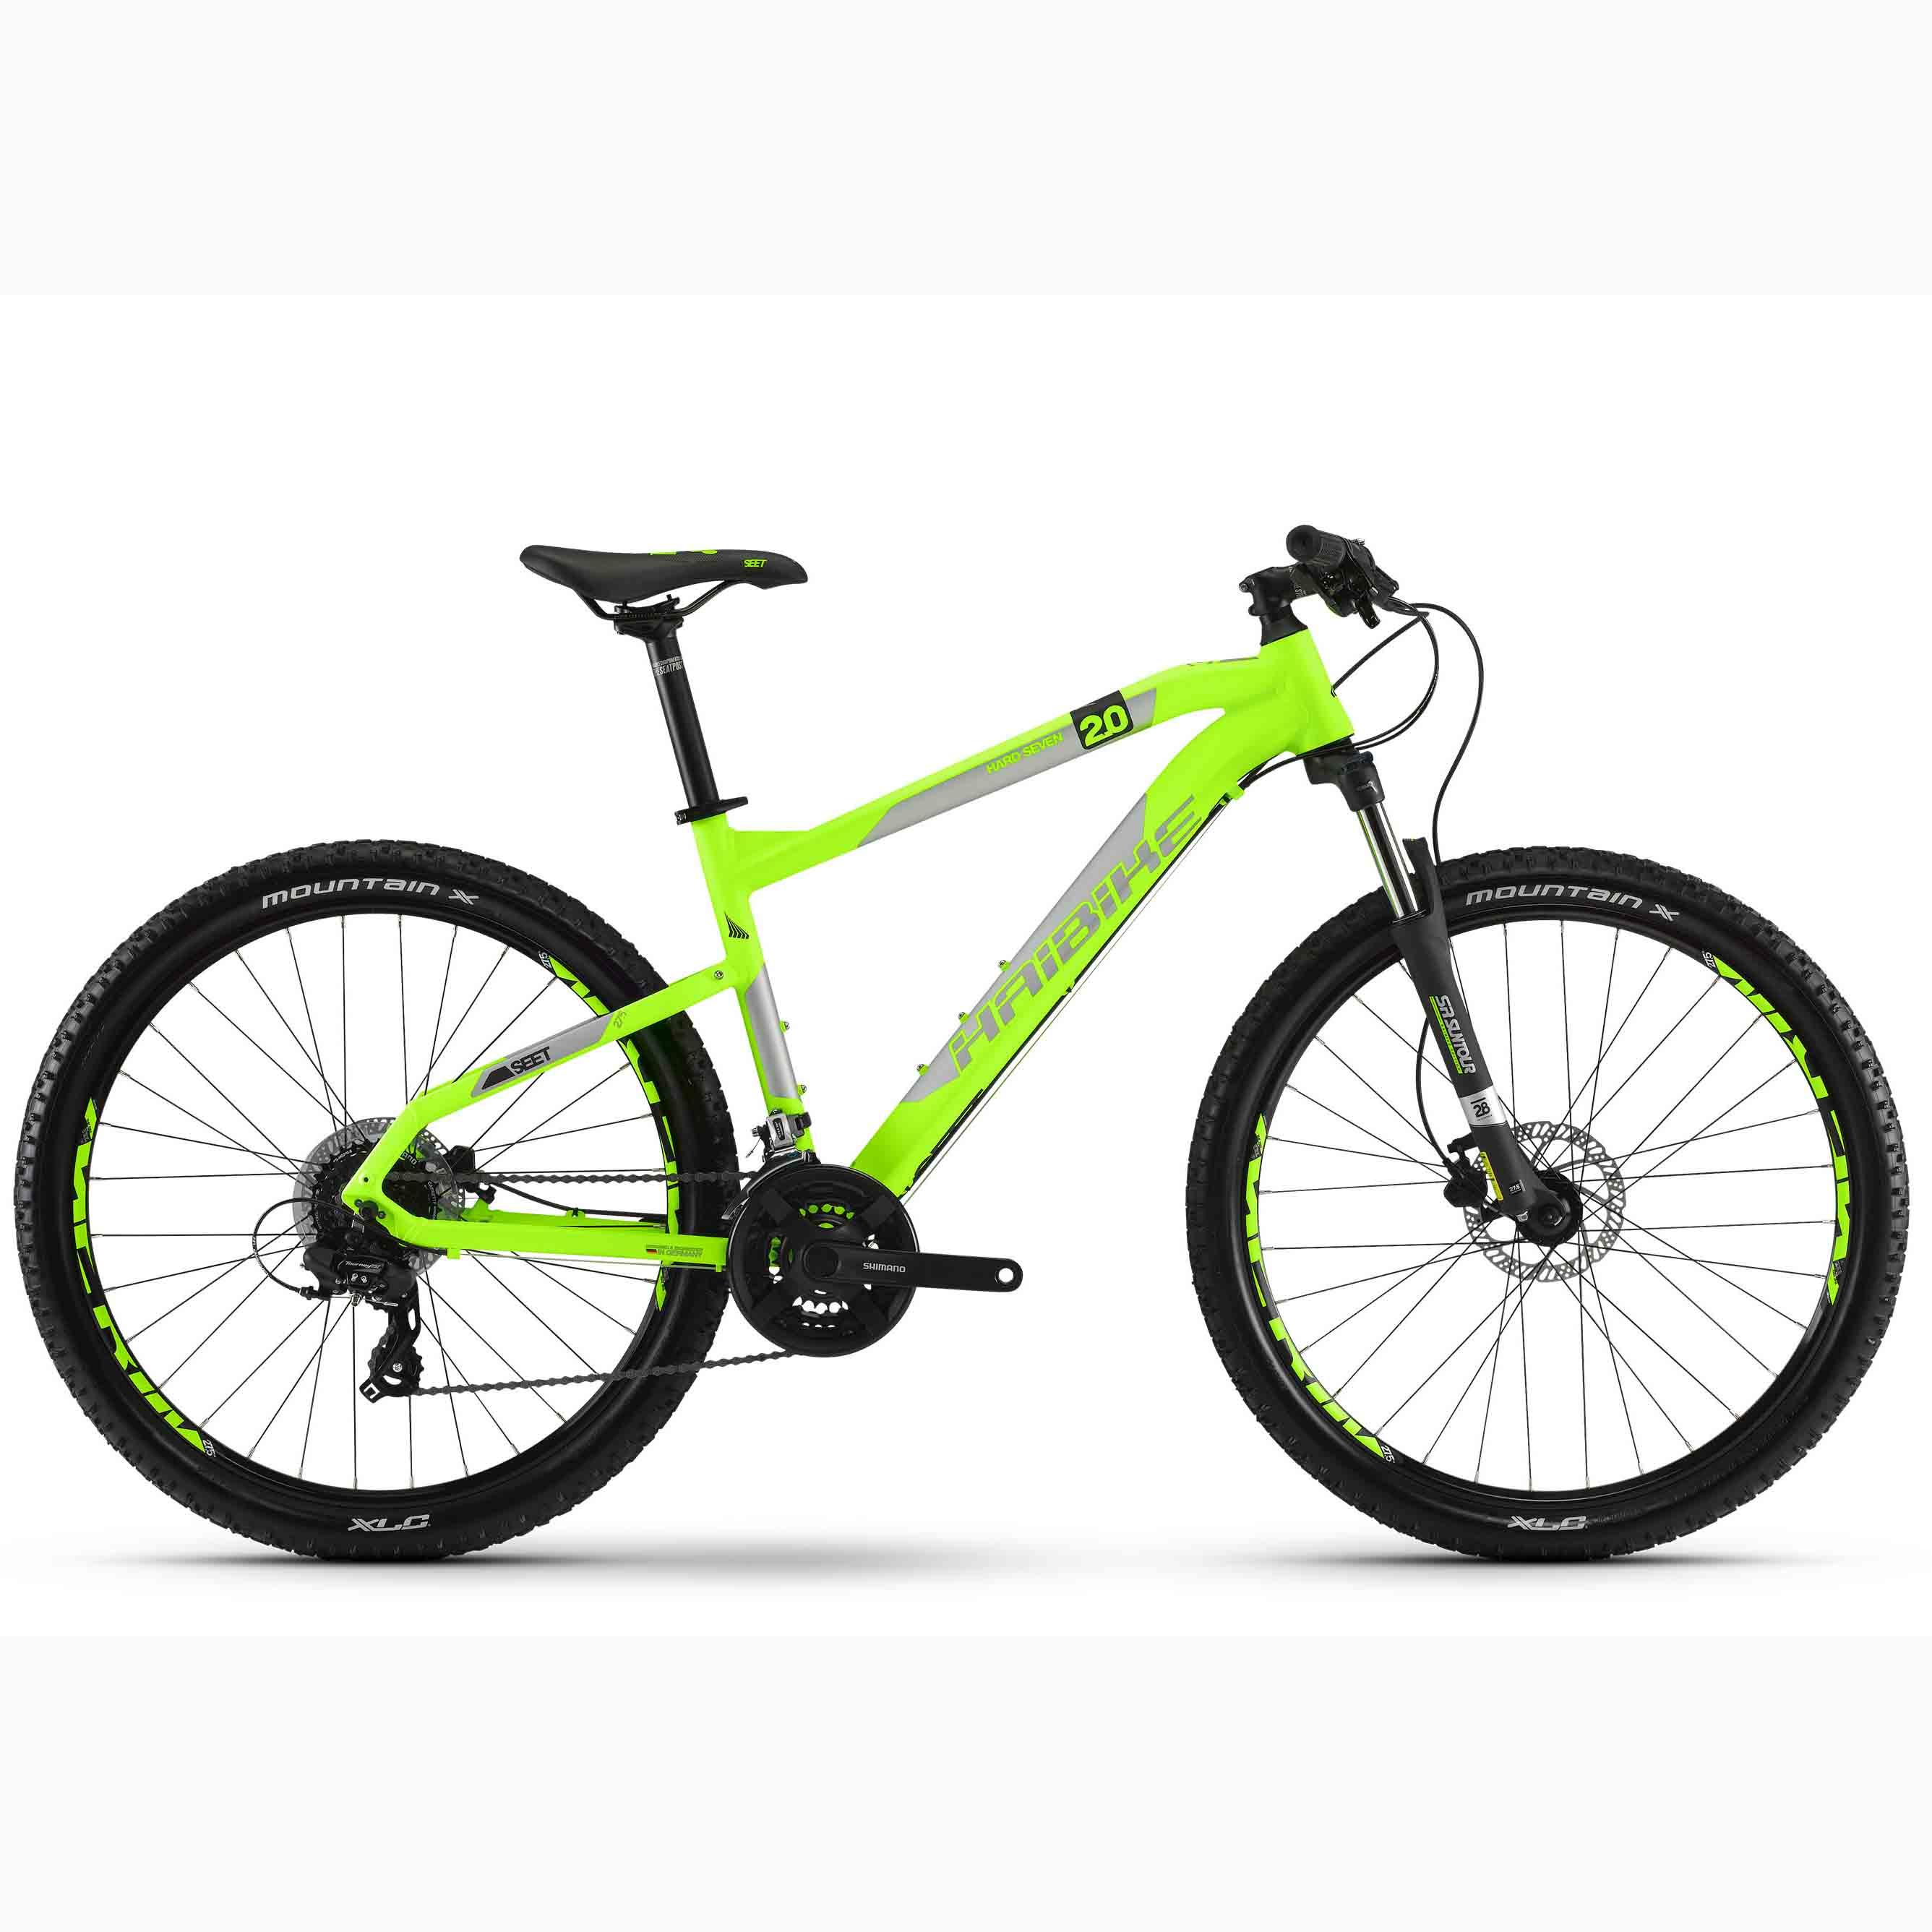 Фото Велосипед Haibike SEET HardSeven 2.0 27,5″, рама 50см, 2018, лайм